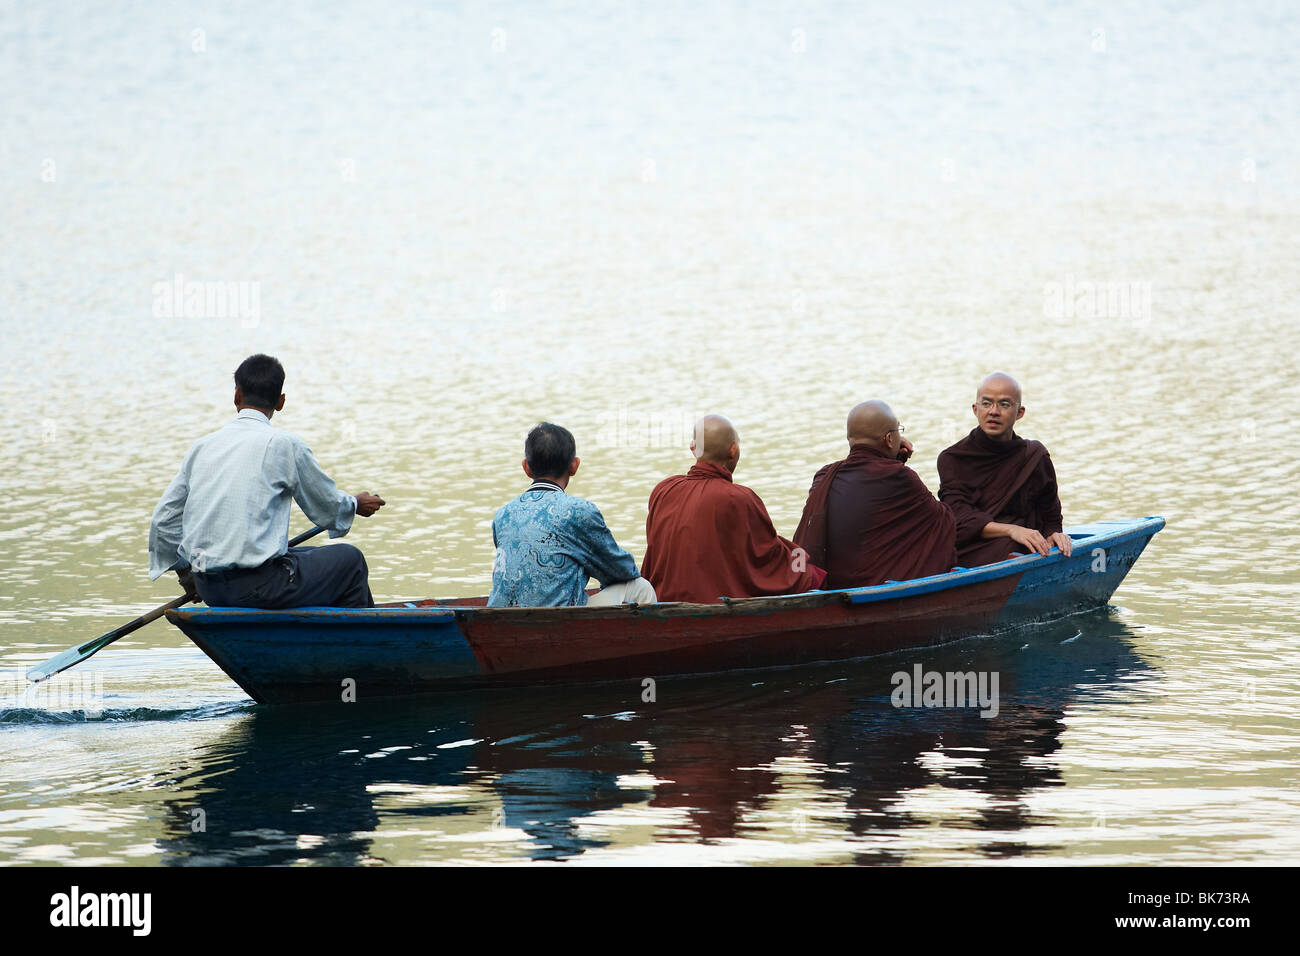 Buddhist monks in a canoe on Pewha Lake in Pokhara, Nepal on Monday October 26, 2009. - Stock Image